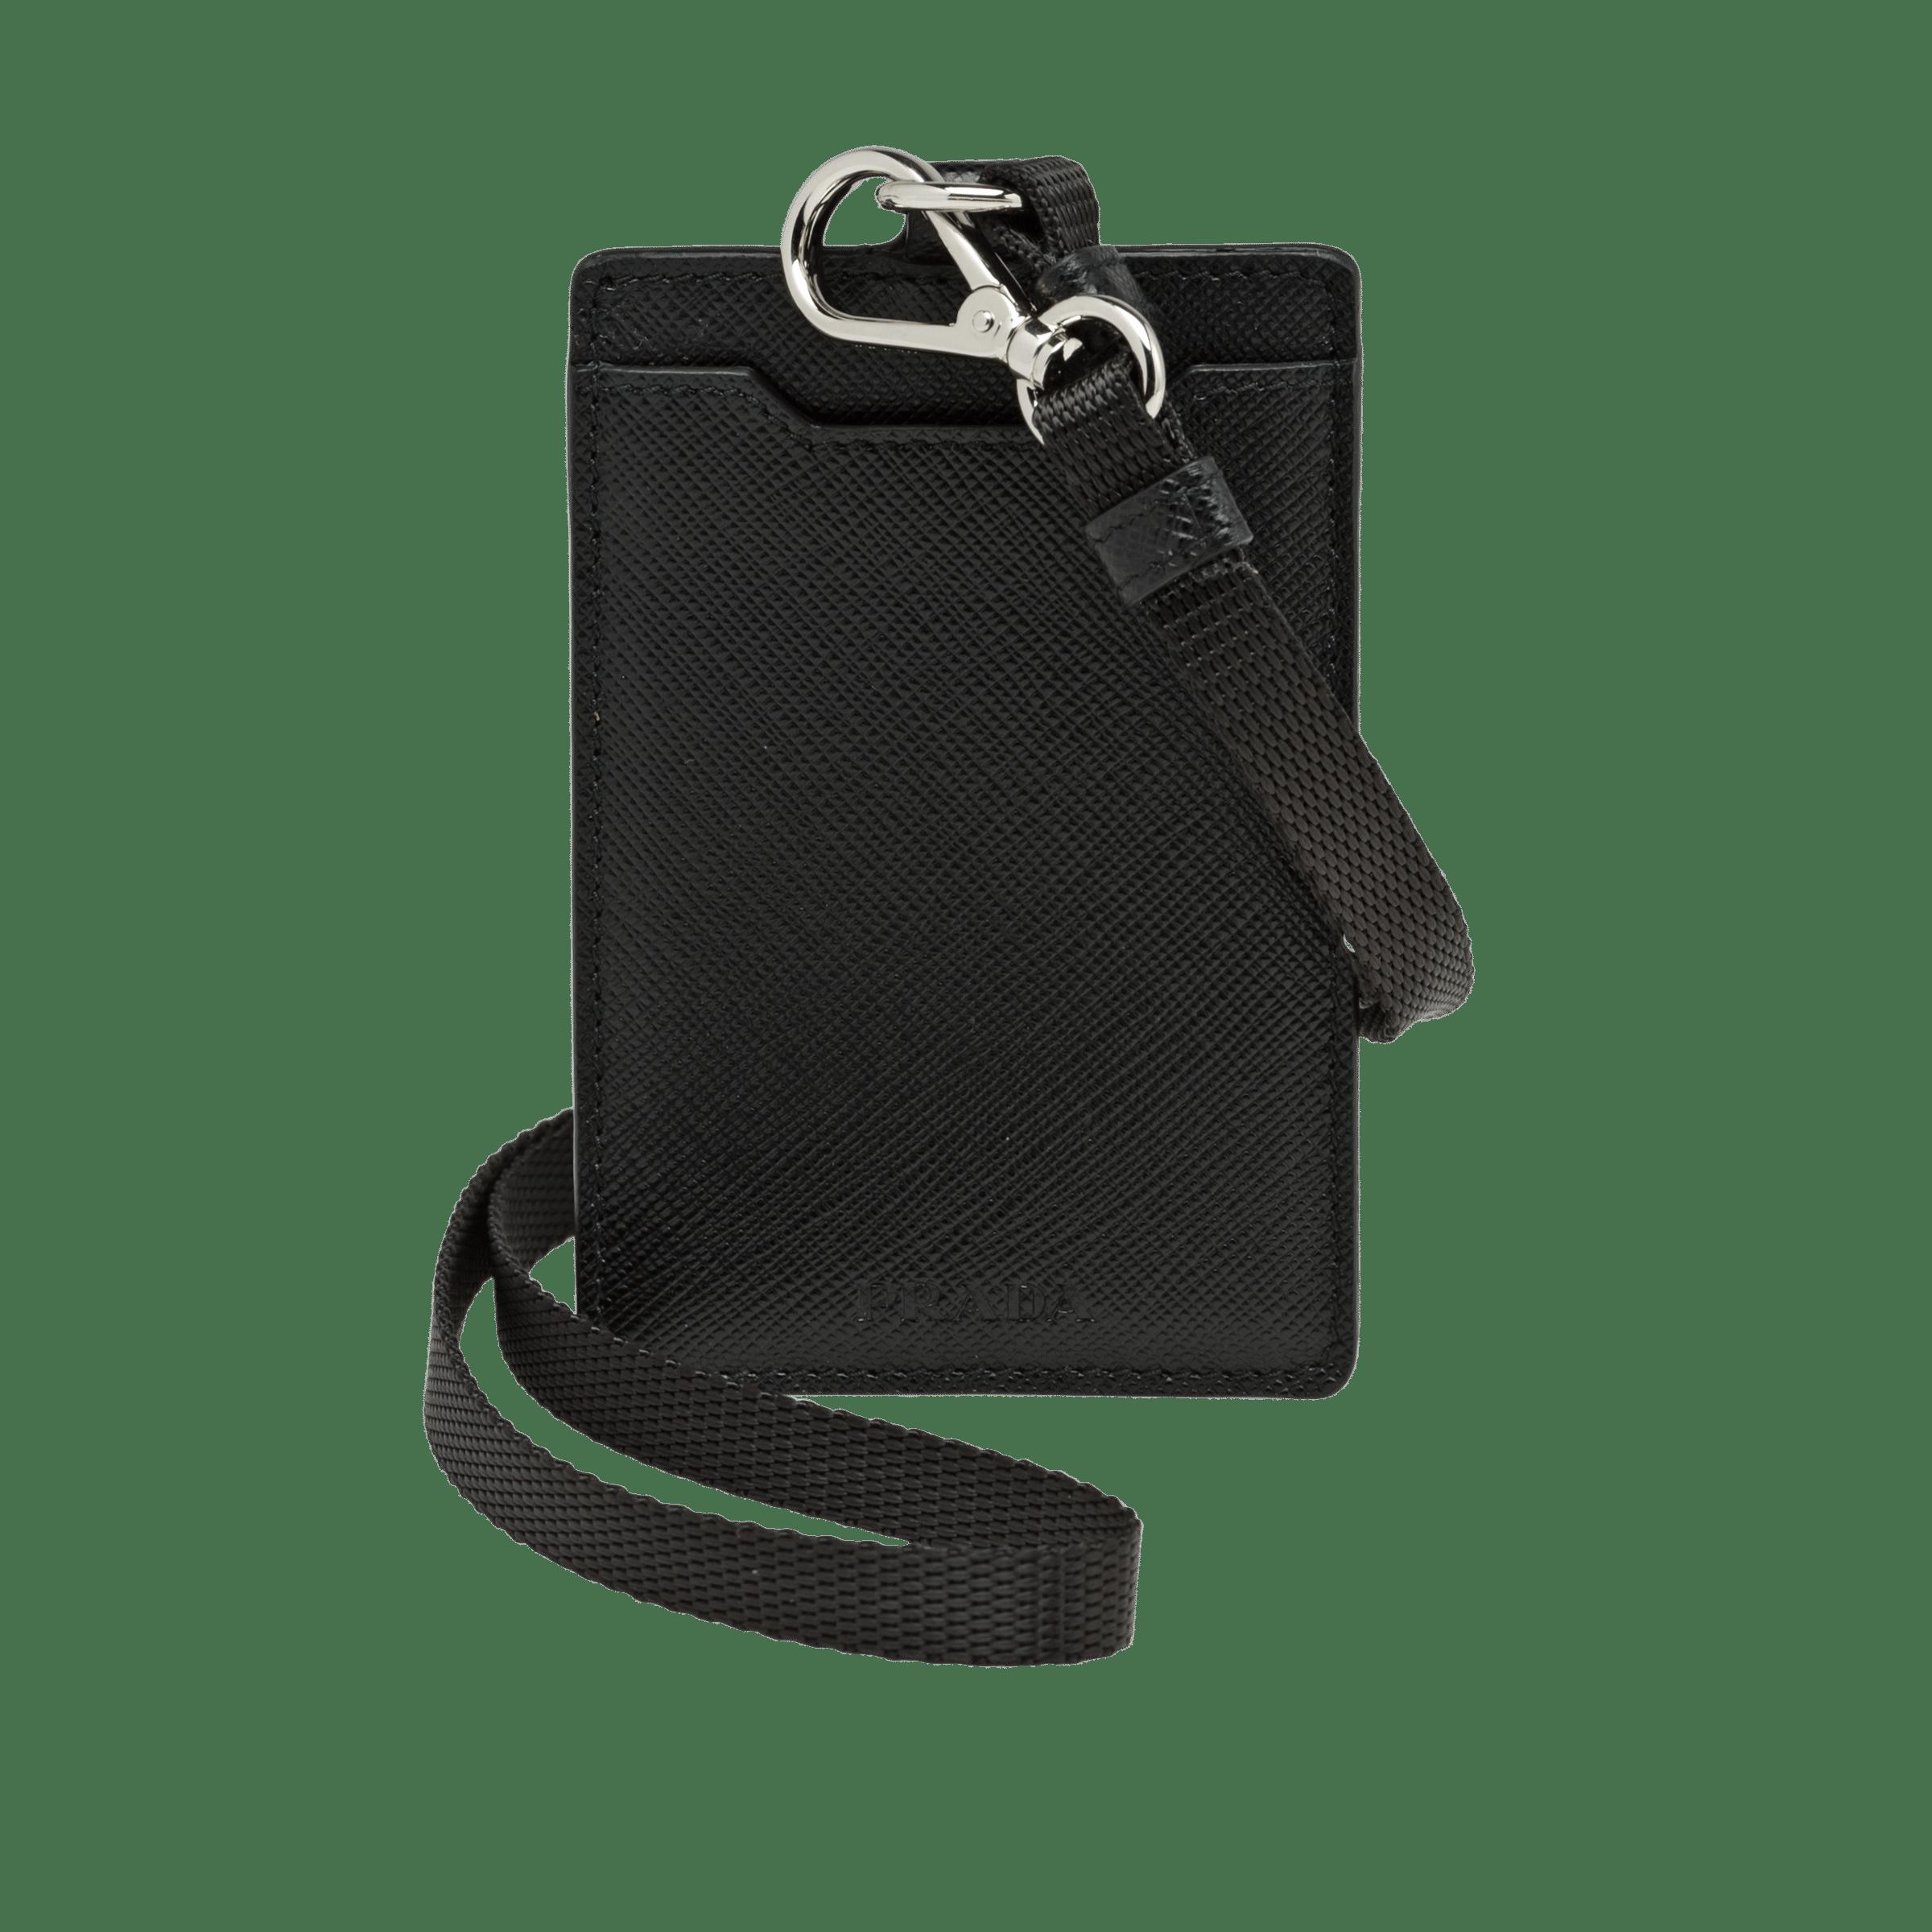 8d5d9c3e720e56 Saffiano Leather Badge Holder BLACK Prada | I.D. Holder | Badge ...